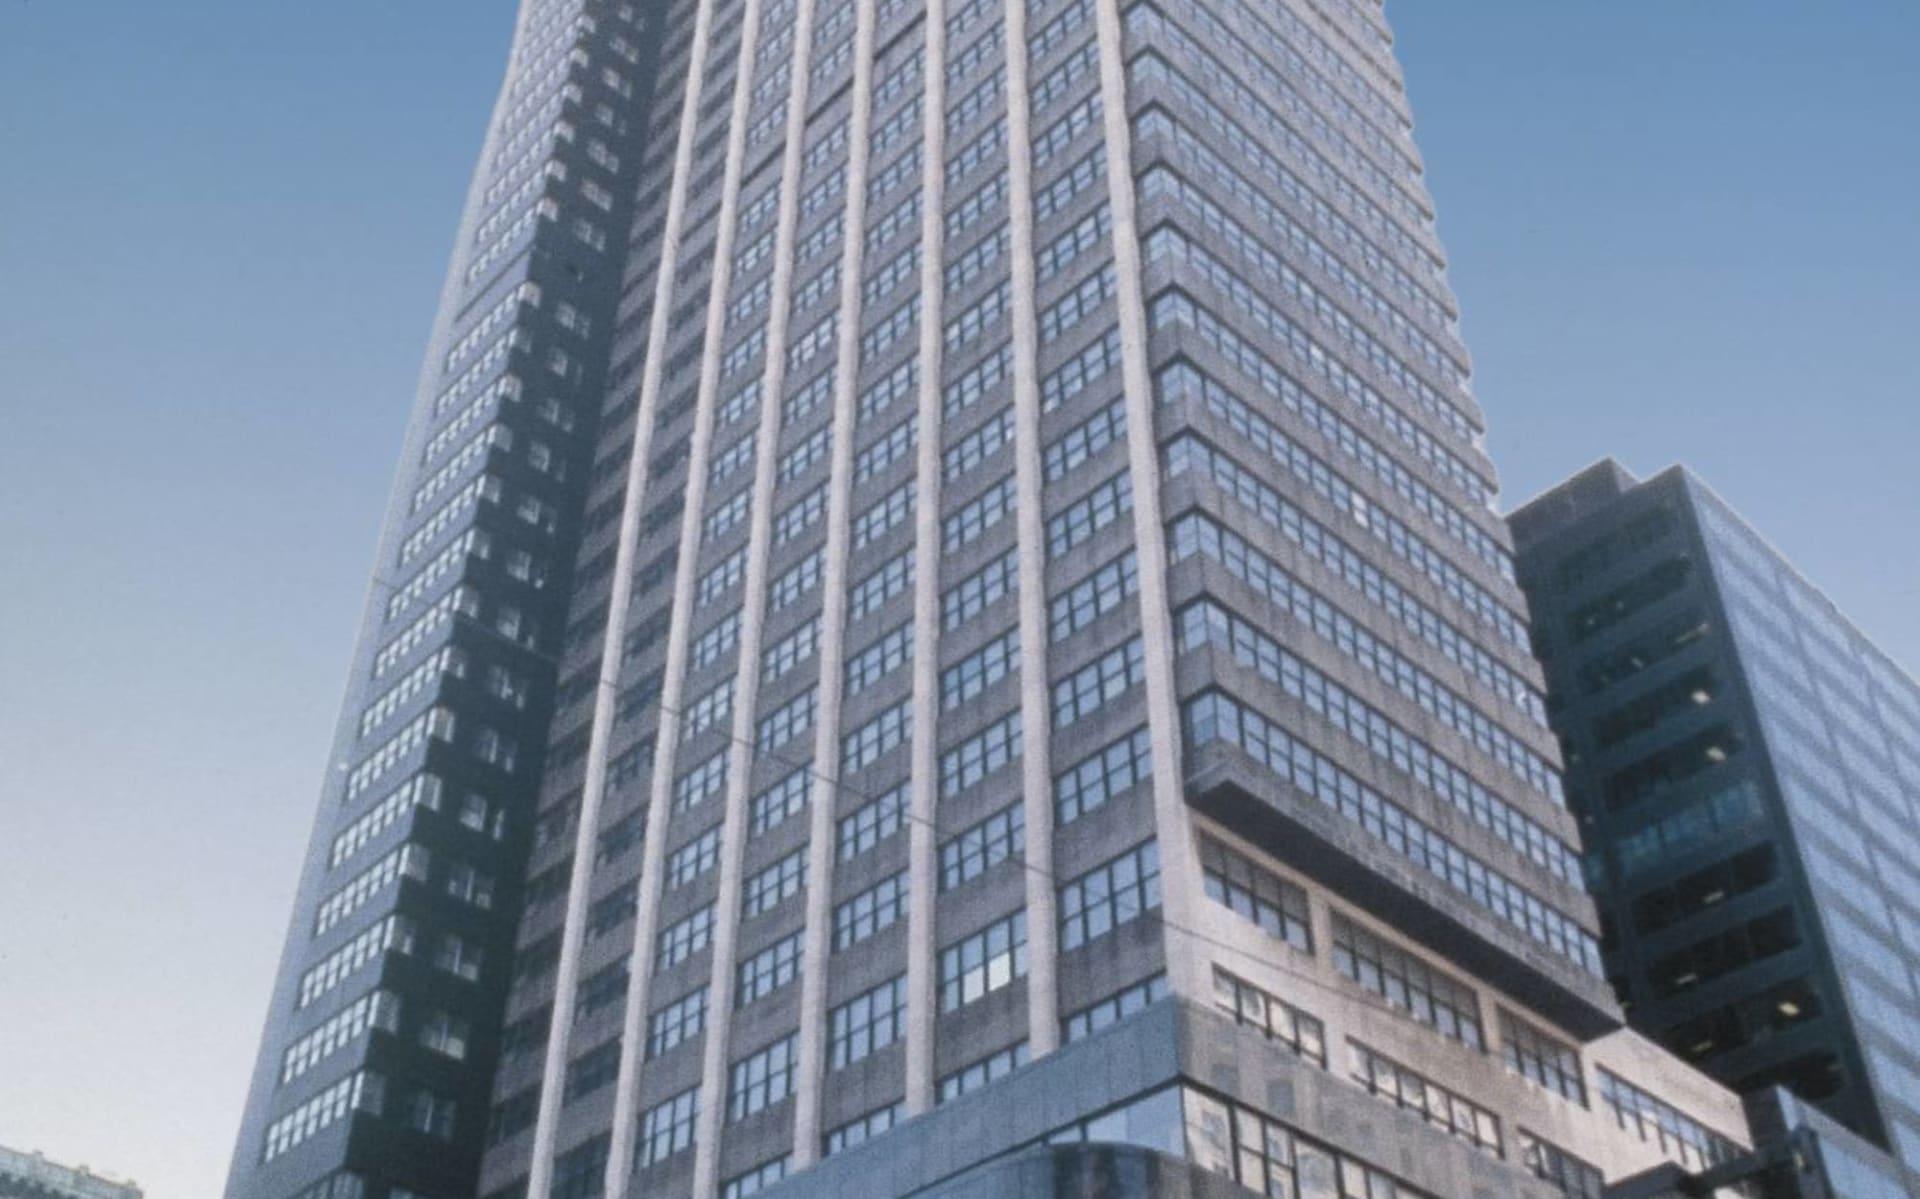 Loews Philadelphia Hotel: Exterior_Loews PHL_Aussenansicht bei Tag_ATI